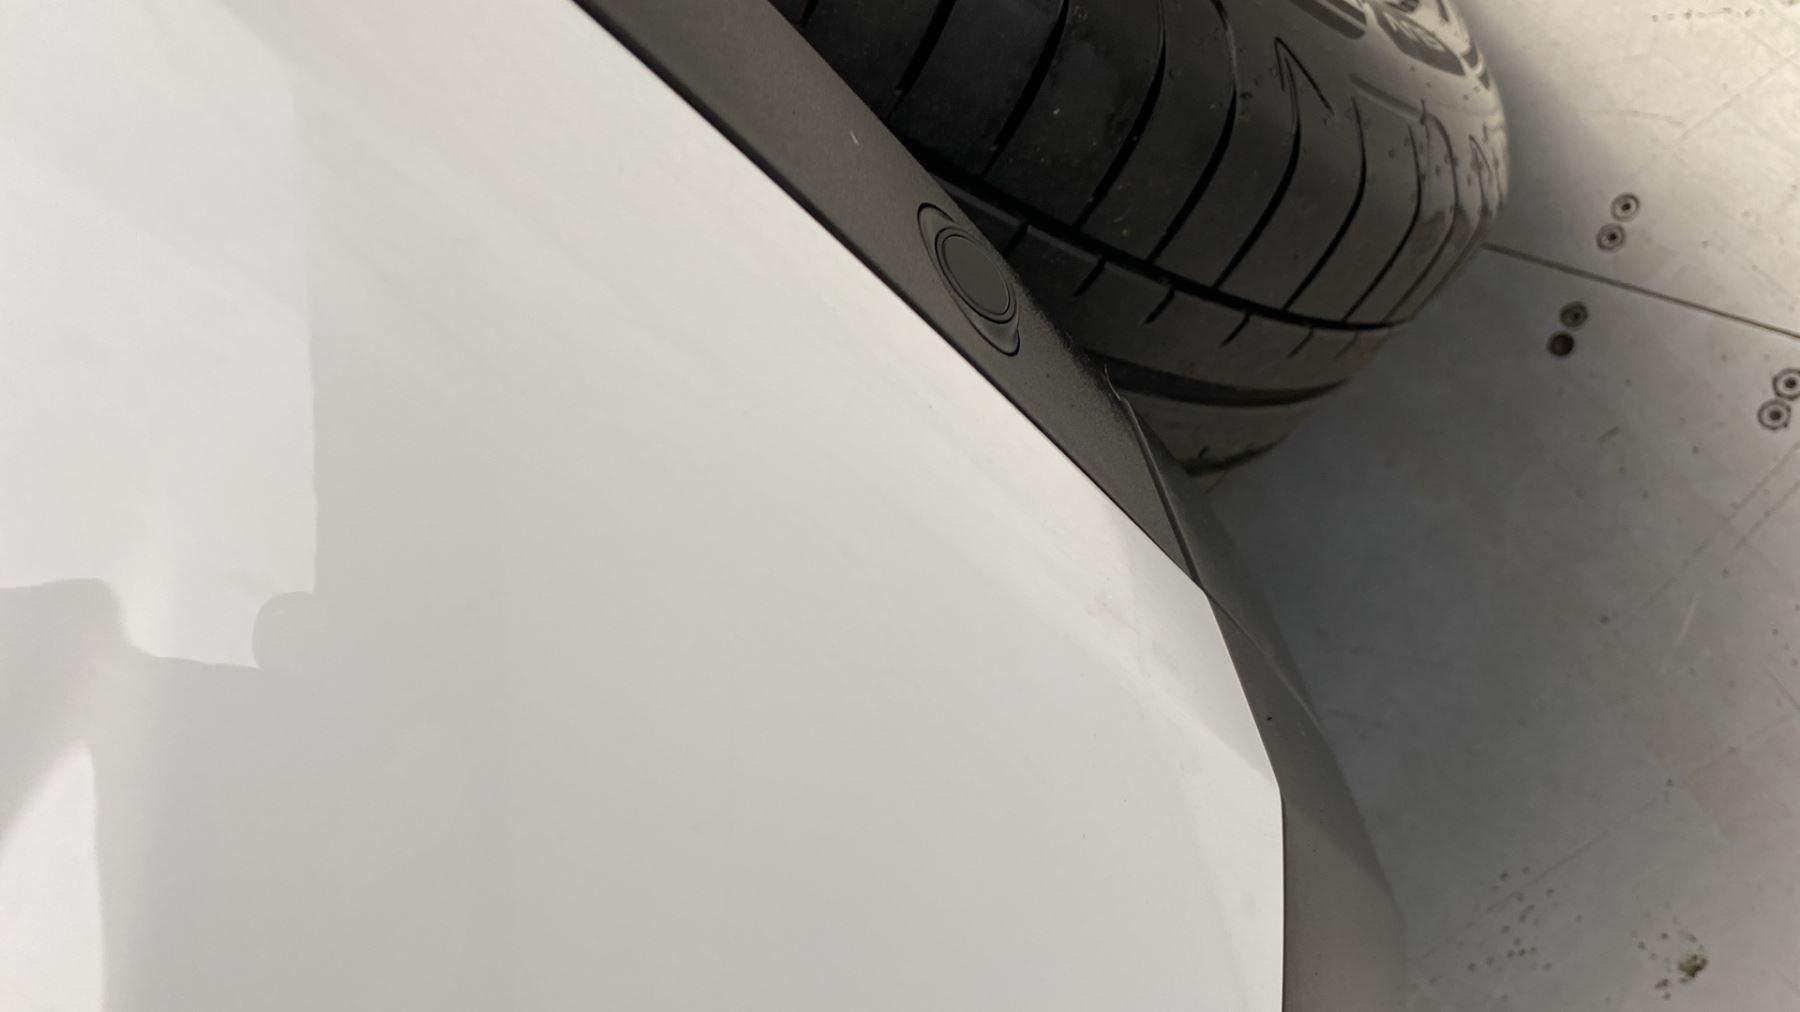 Jaguar E-PACE 2.0d SE AWD - Meridian Sound System - Powered Seats - Satellite Navigation image 31